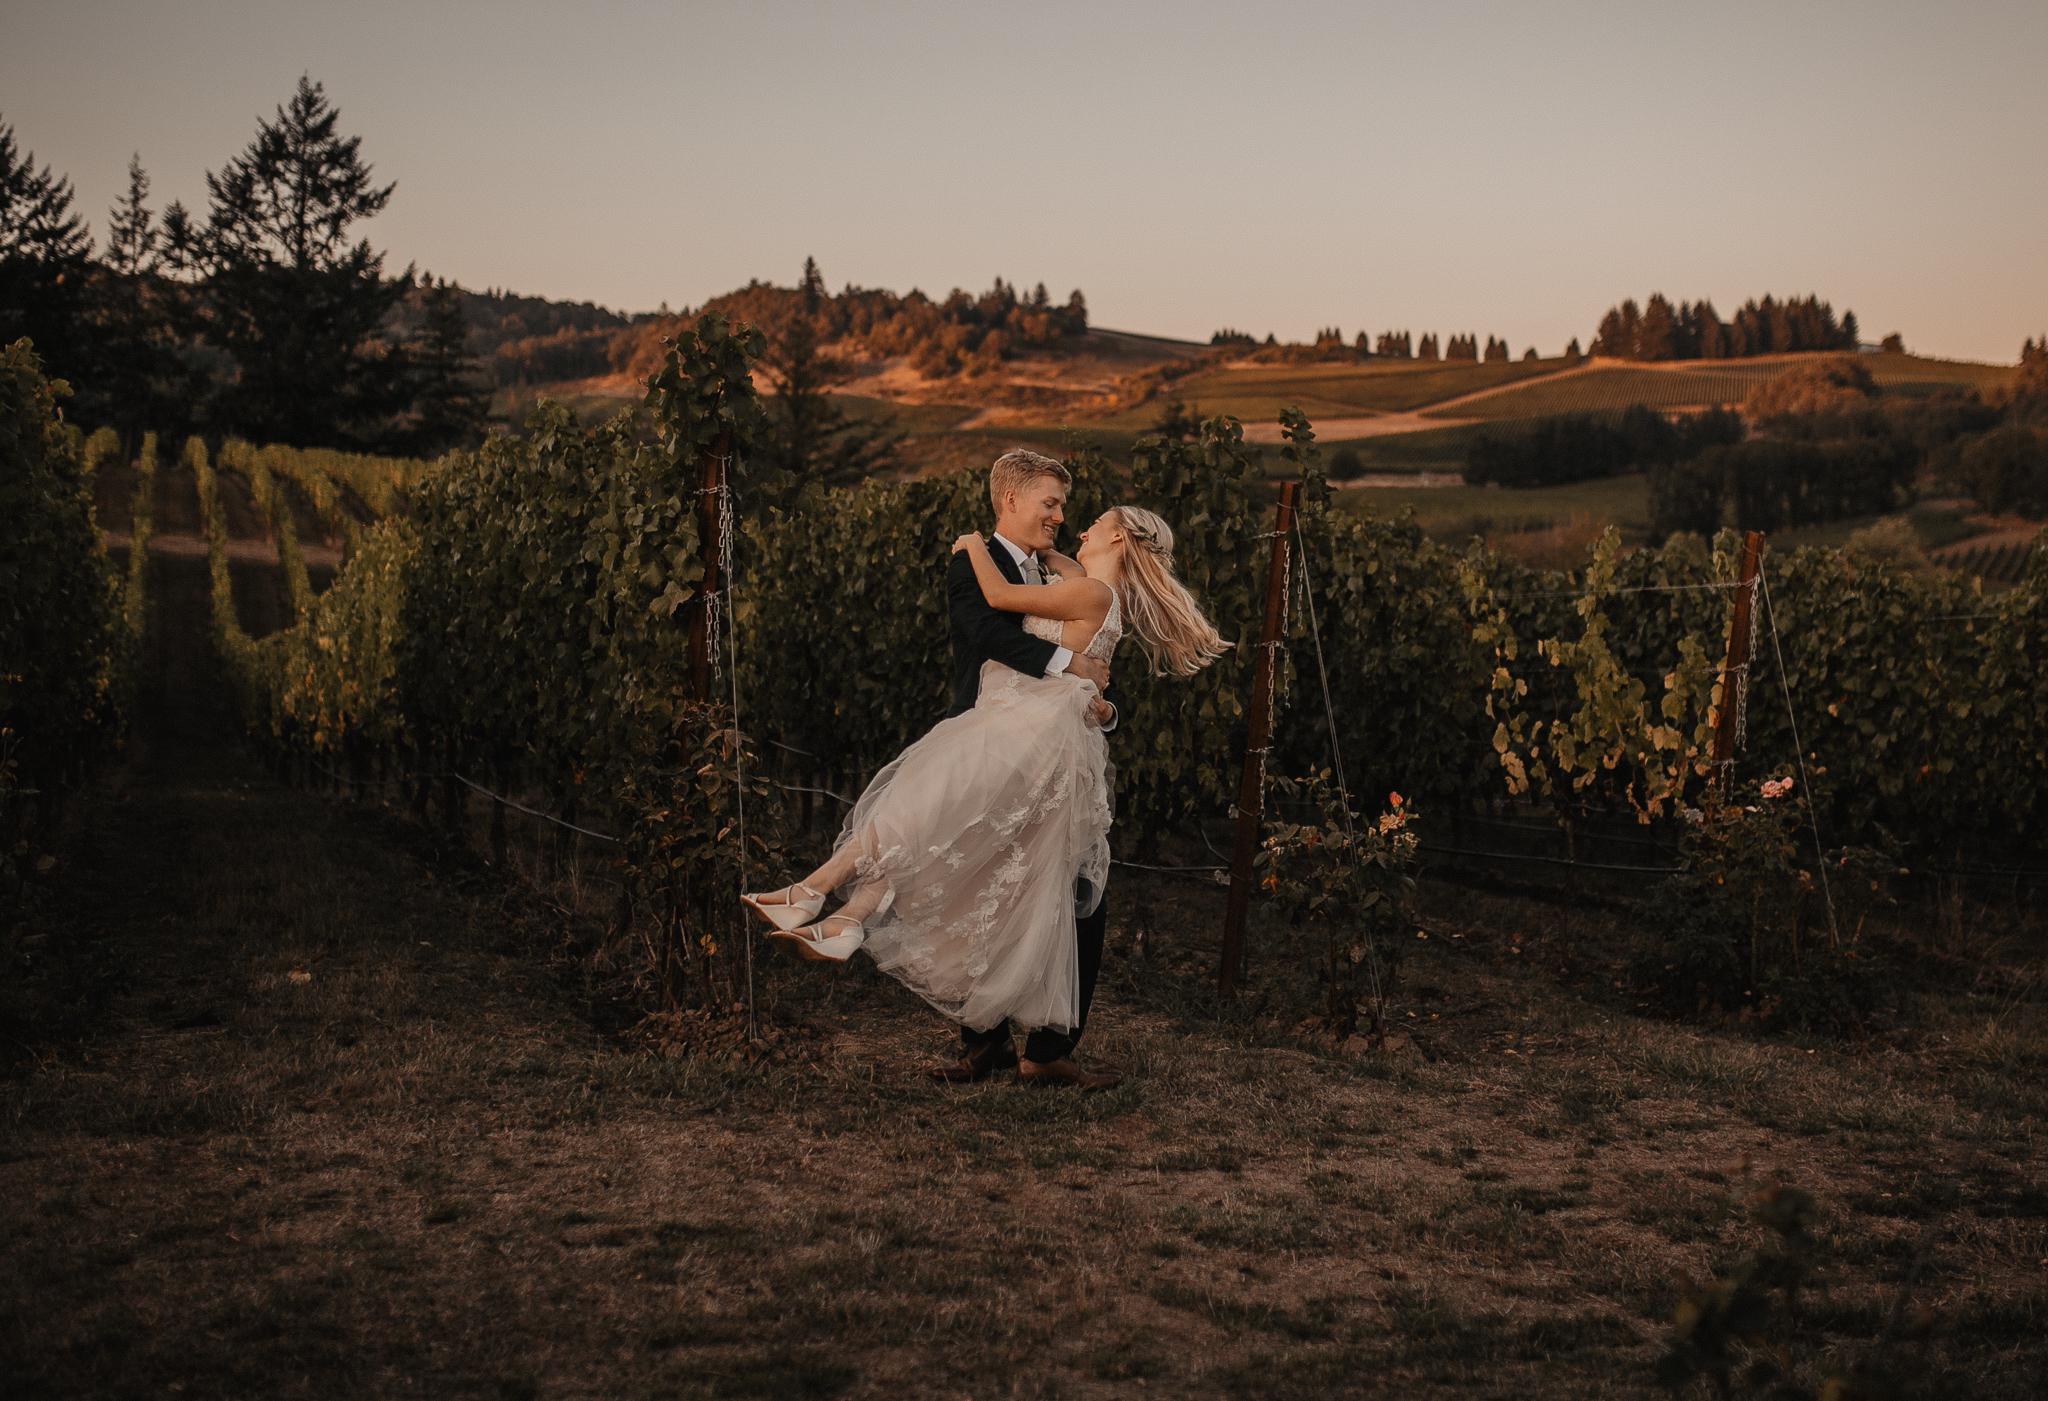 zenith-vineyard-oregon-summer-wedding-847.jpg